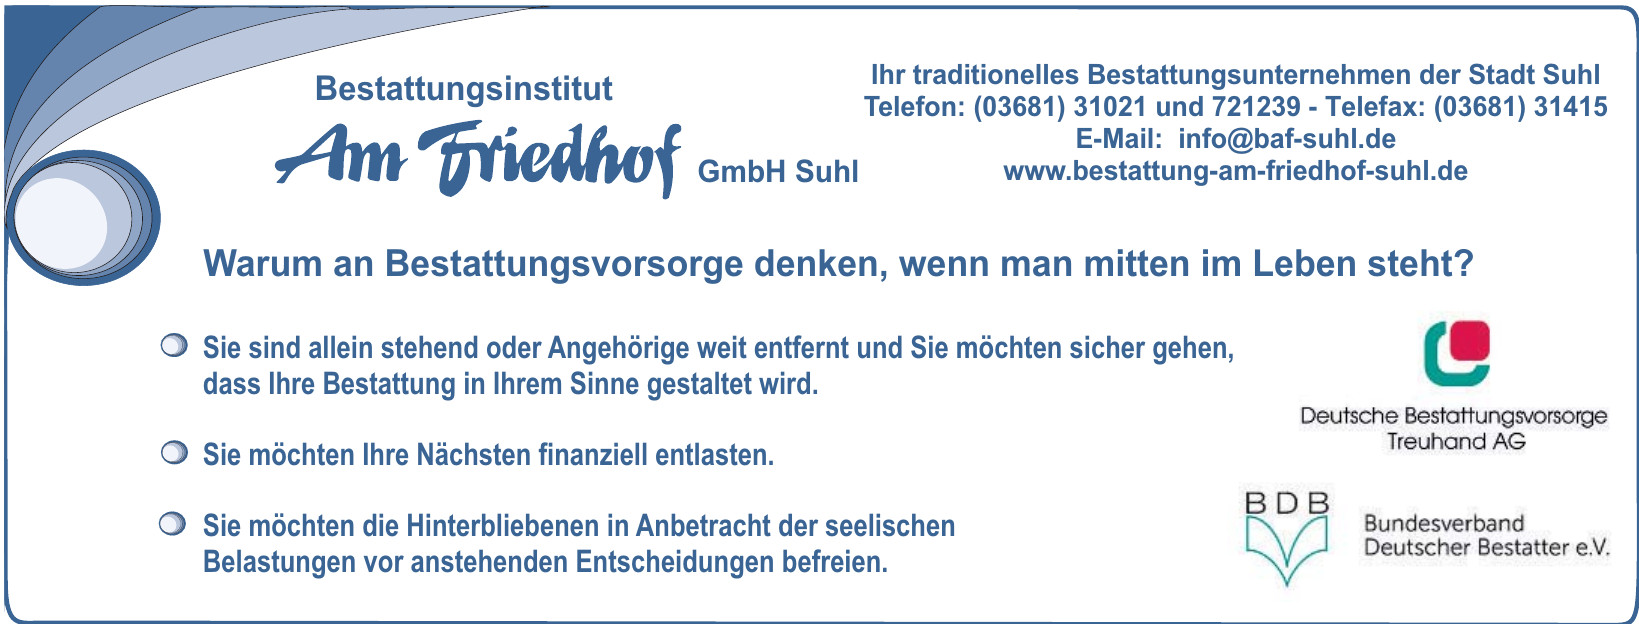 Bestattungsinstitut Am Friehof GmbH Suhl